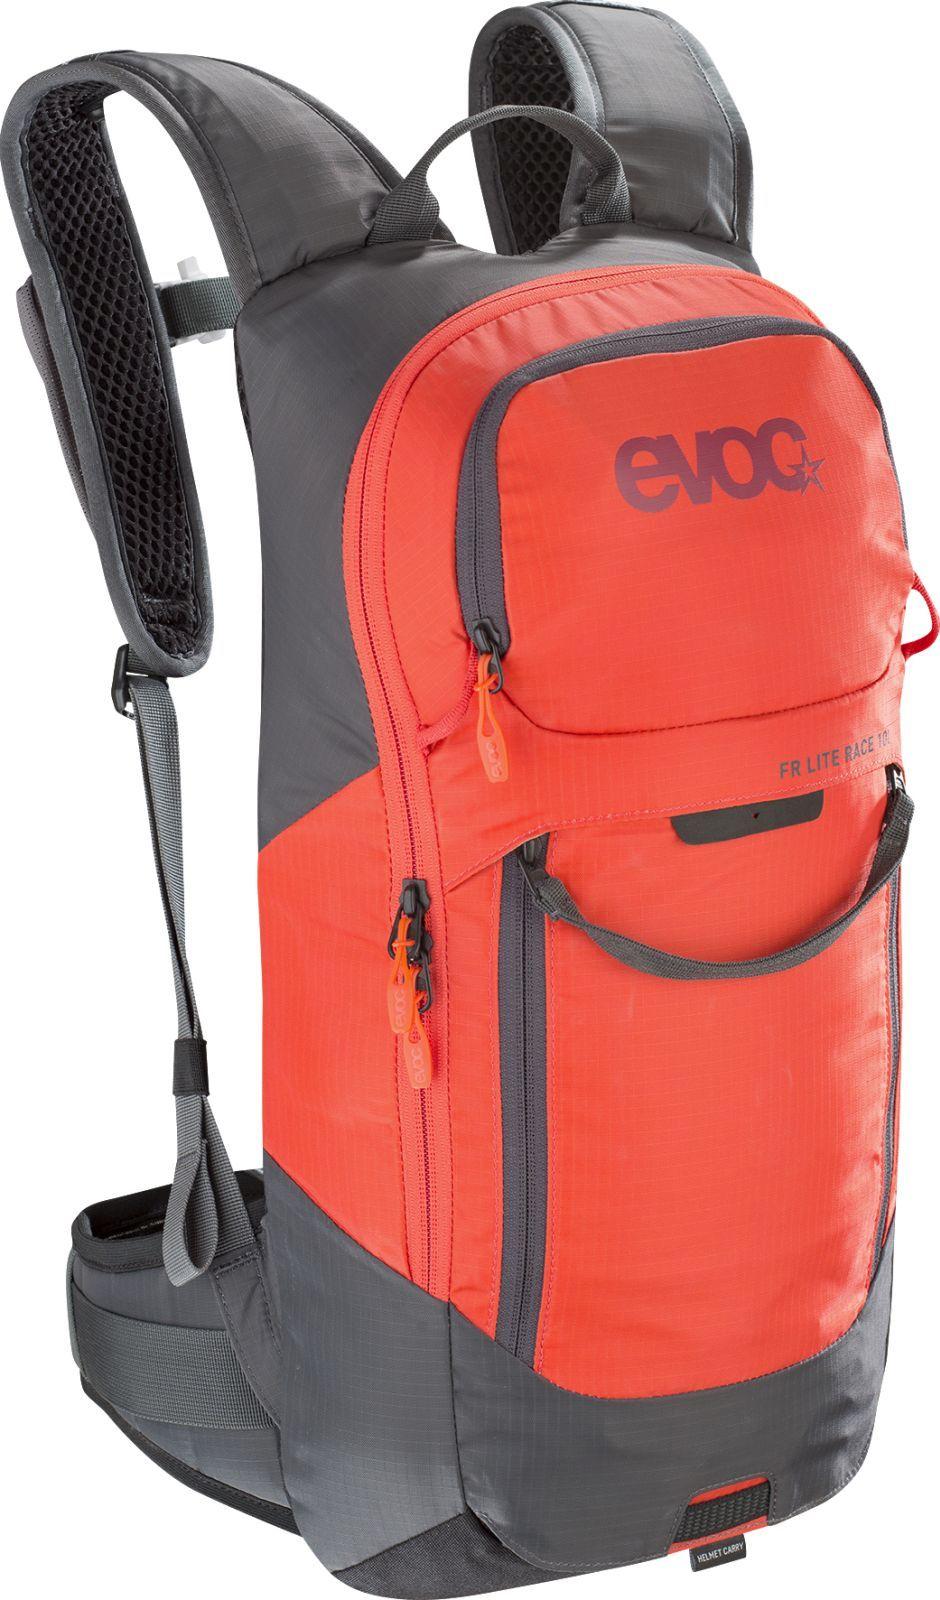 383e18bf51 Cyklistický batoh s chráničem páteře Evoc FR Lite Race 10L - carbon grey  orange